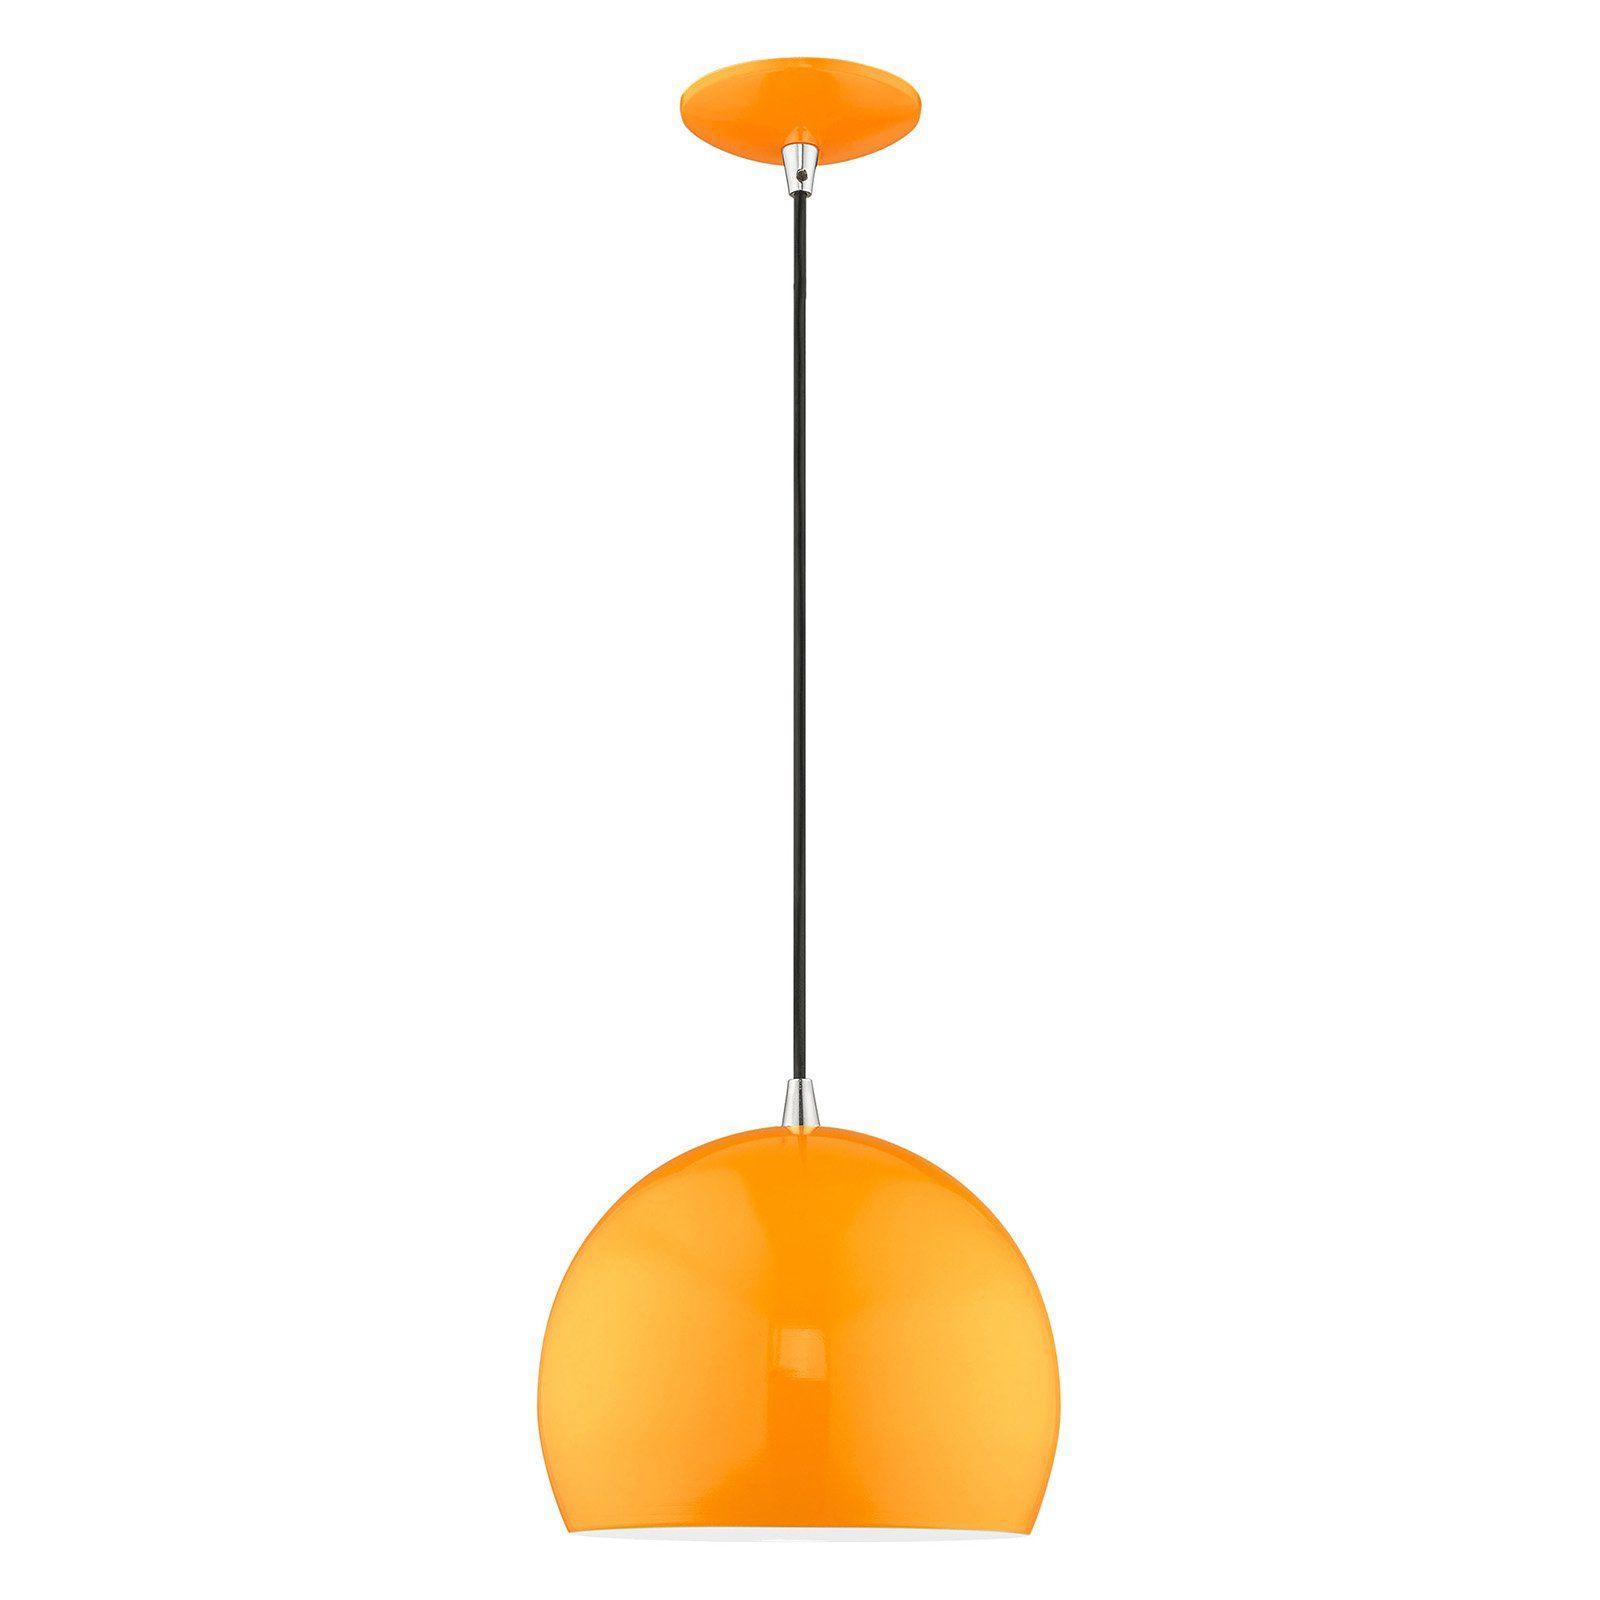 Livex Lighting Retro Pendant Light Products In 2019